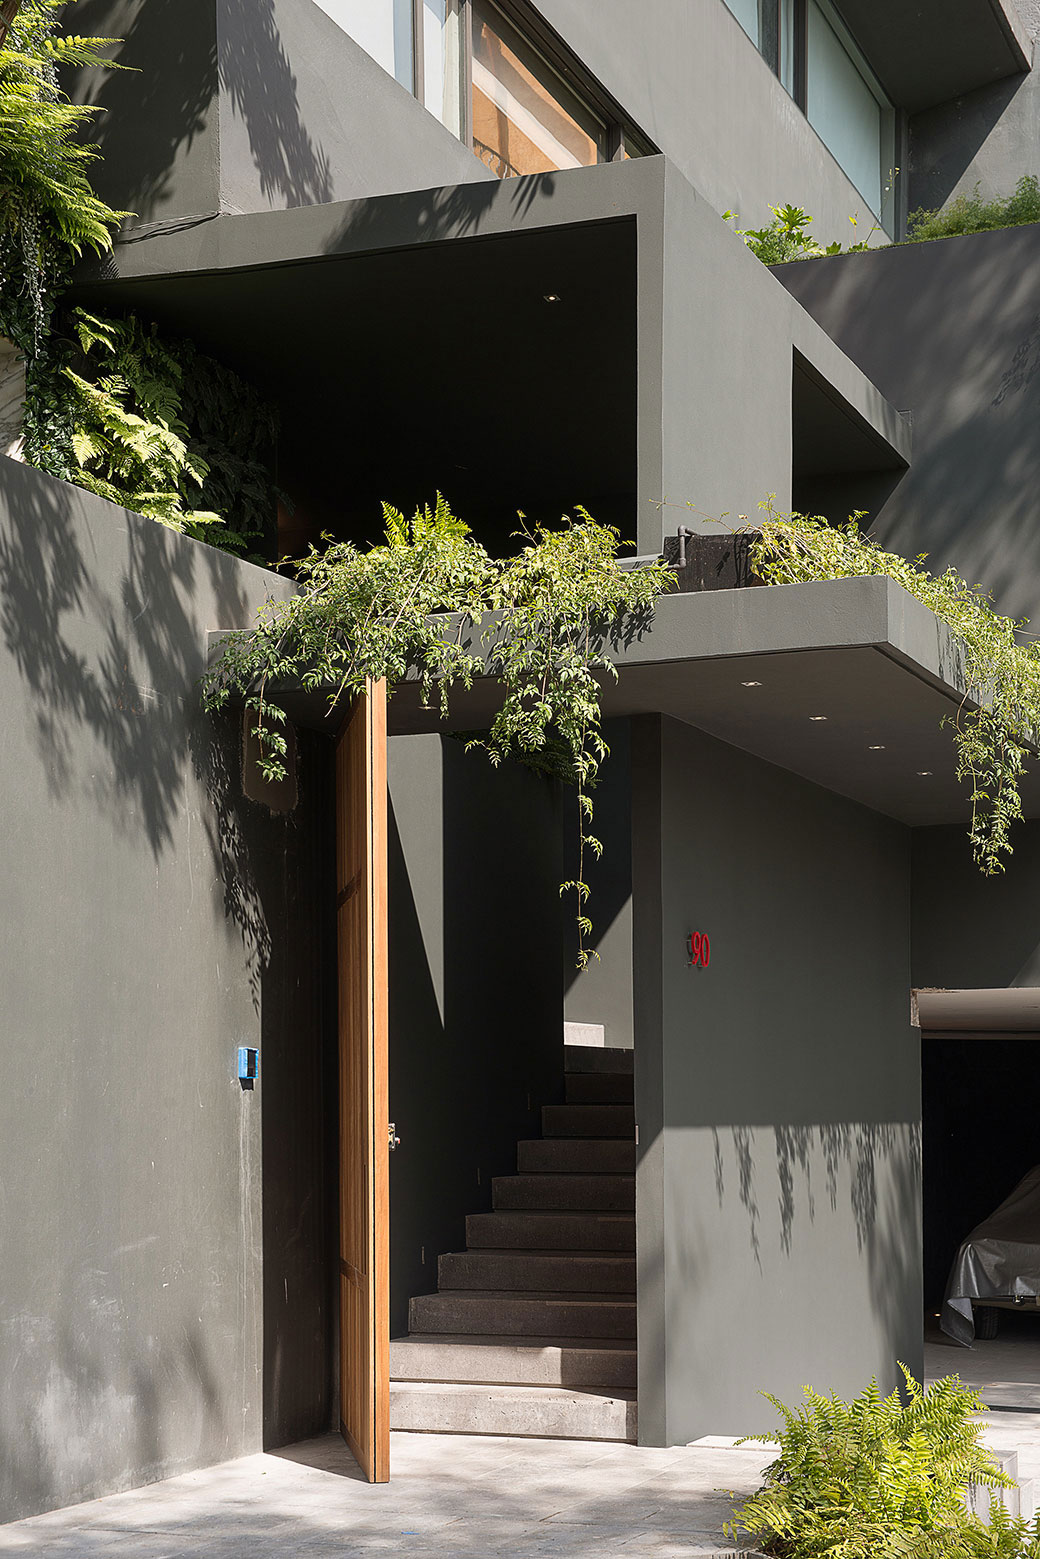 Barrancas-huset erbjuder en inblick i lyxboende 2 Barrancas-huset erbjuder en inblick i lyxboende